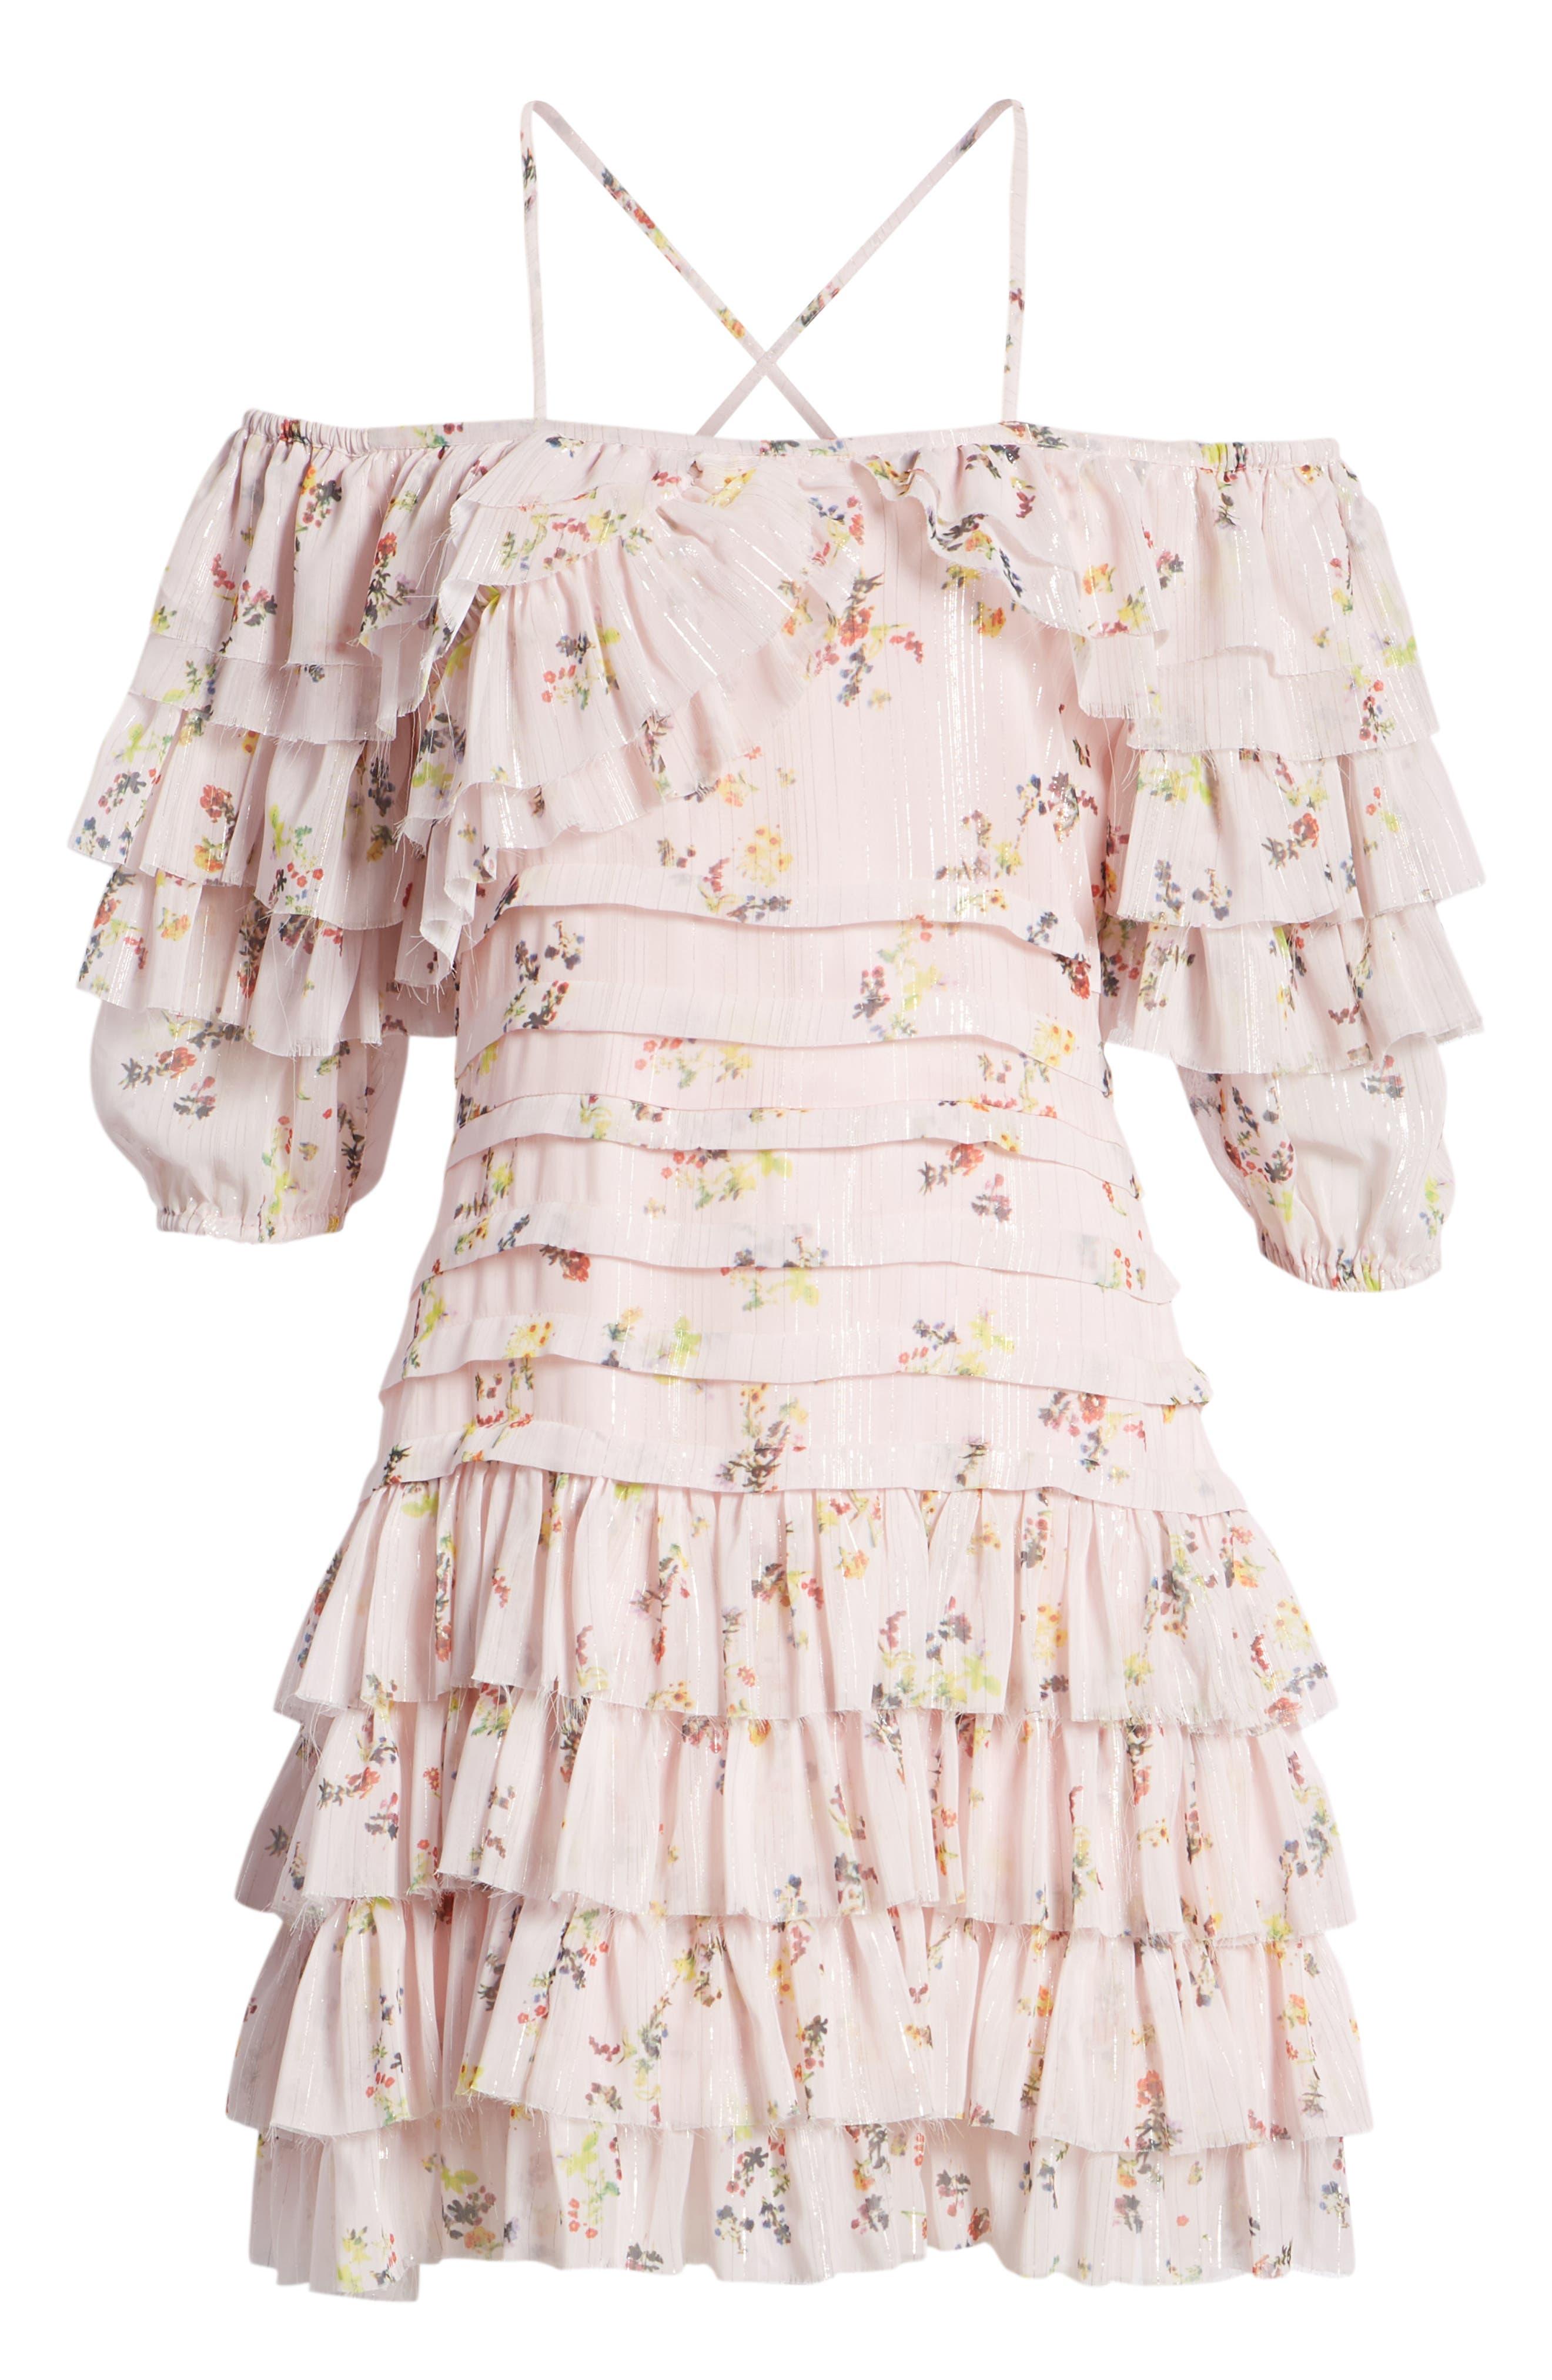 Mina Ruffled Cold Shoulder Dress,                             Alternate thumbnail 7, color,                             650